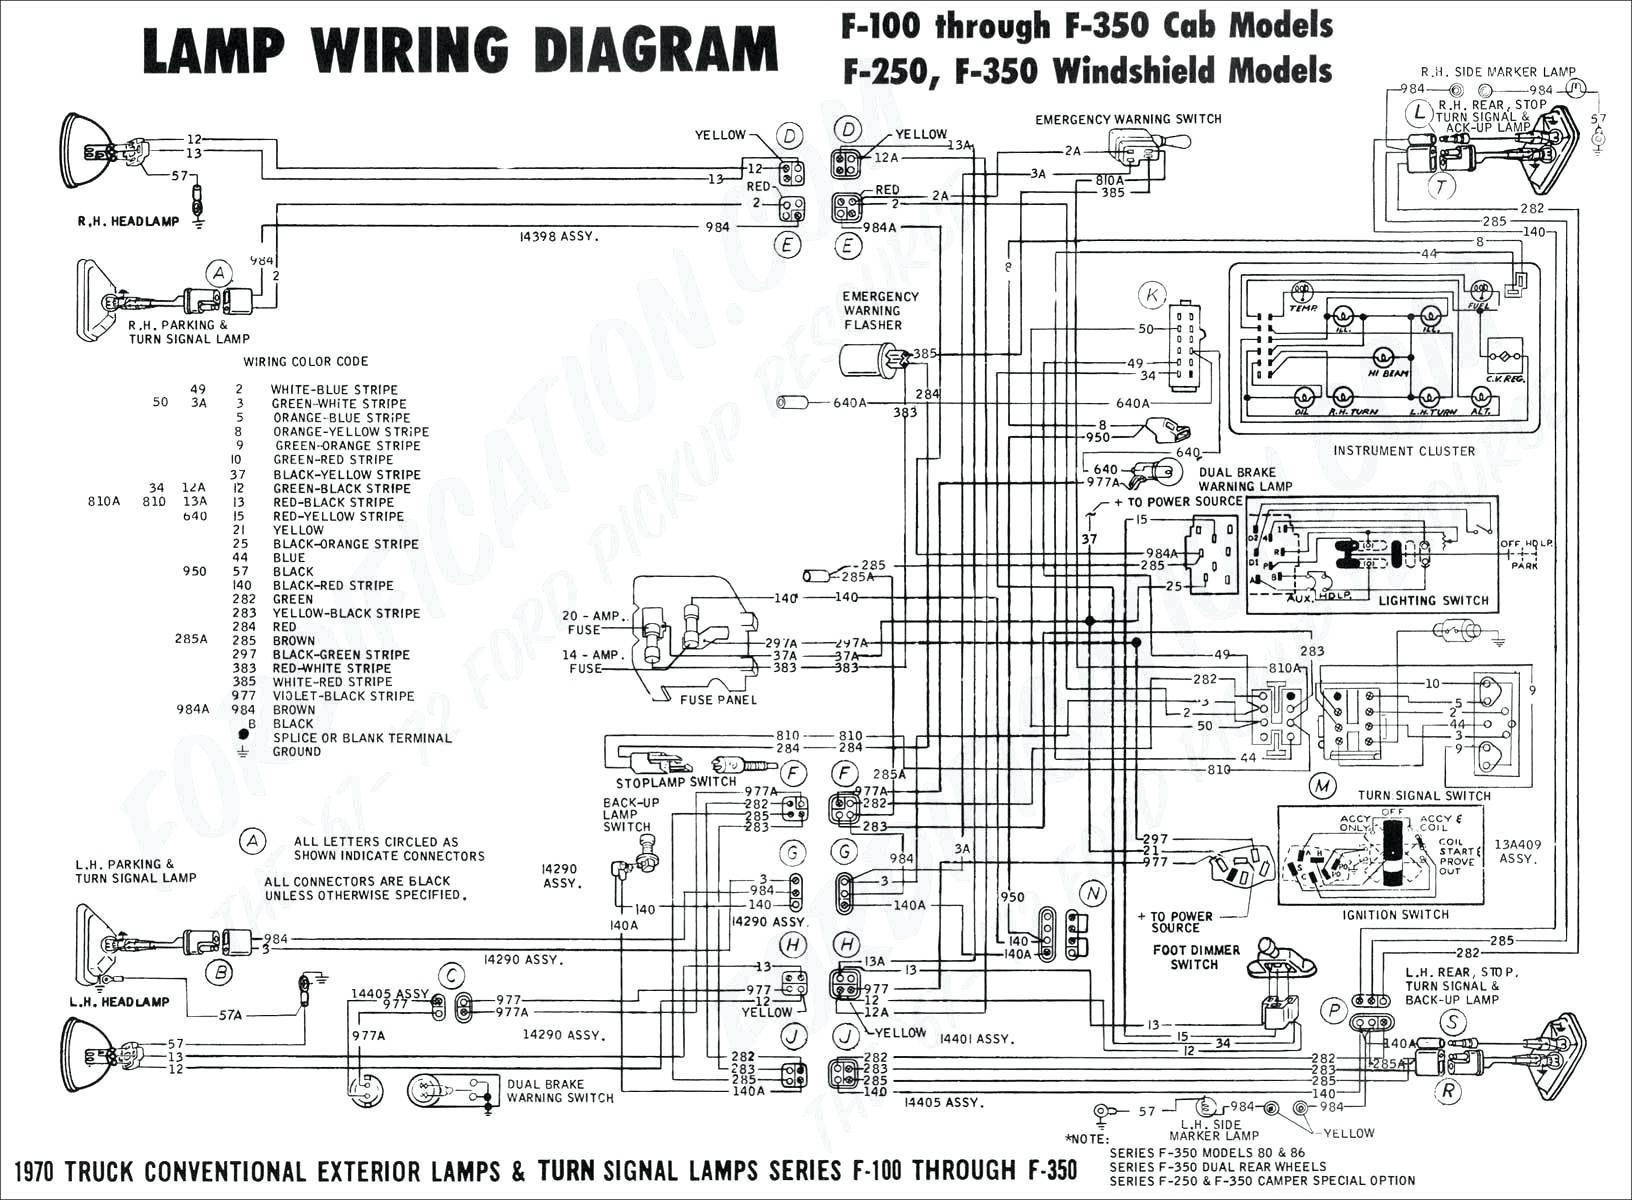 2002 Gmc sonoma Engine Diagram 2000 Gmc sonoma Wiring Diagram Fog Lamp Worksheet and Wiring Diagram • Of 2002 Gmc sonoma Engine Diagram